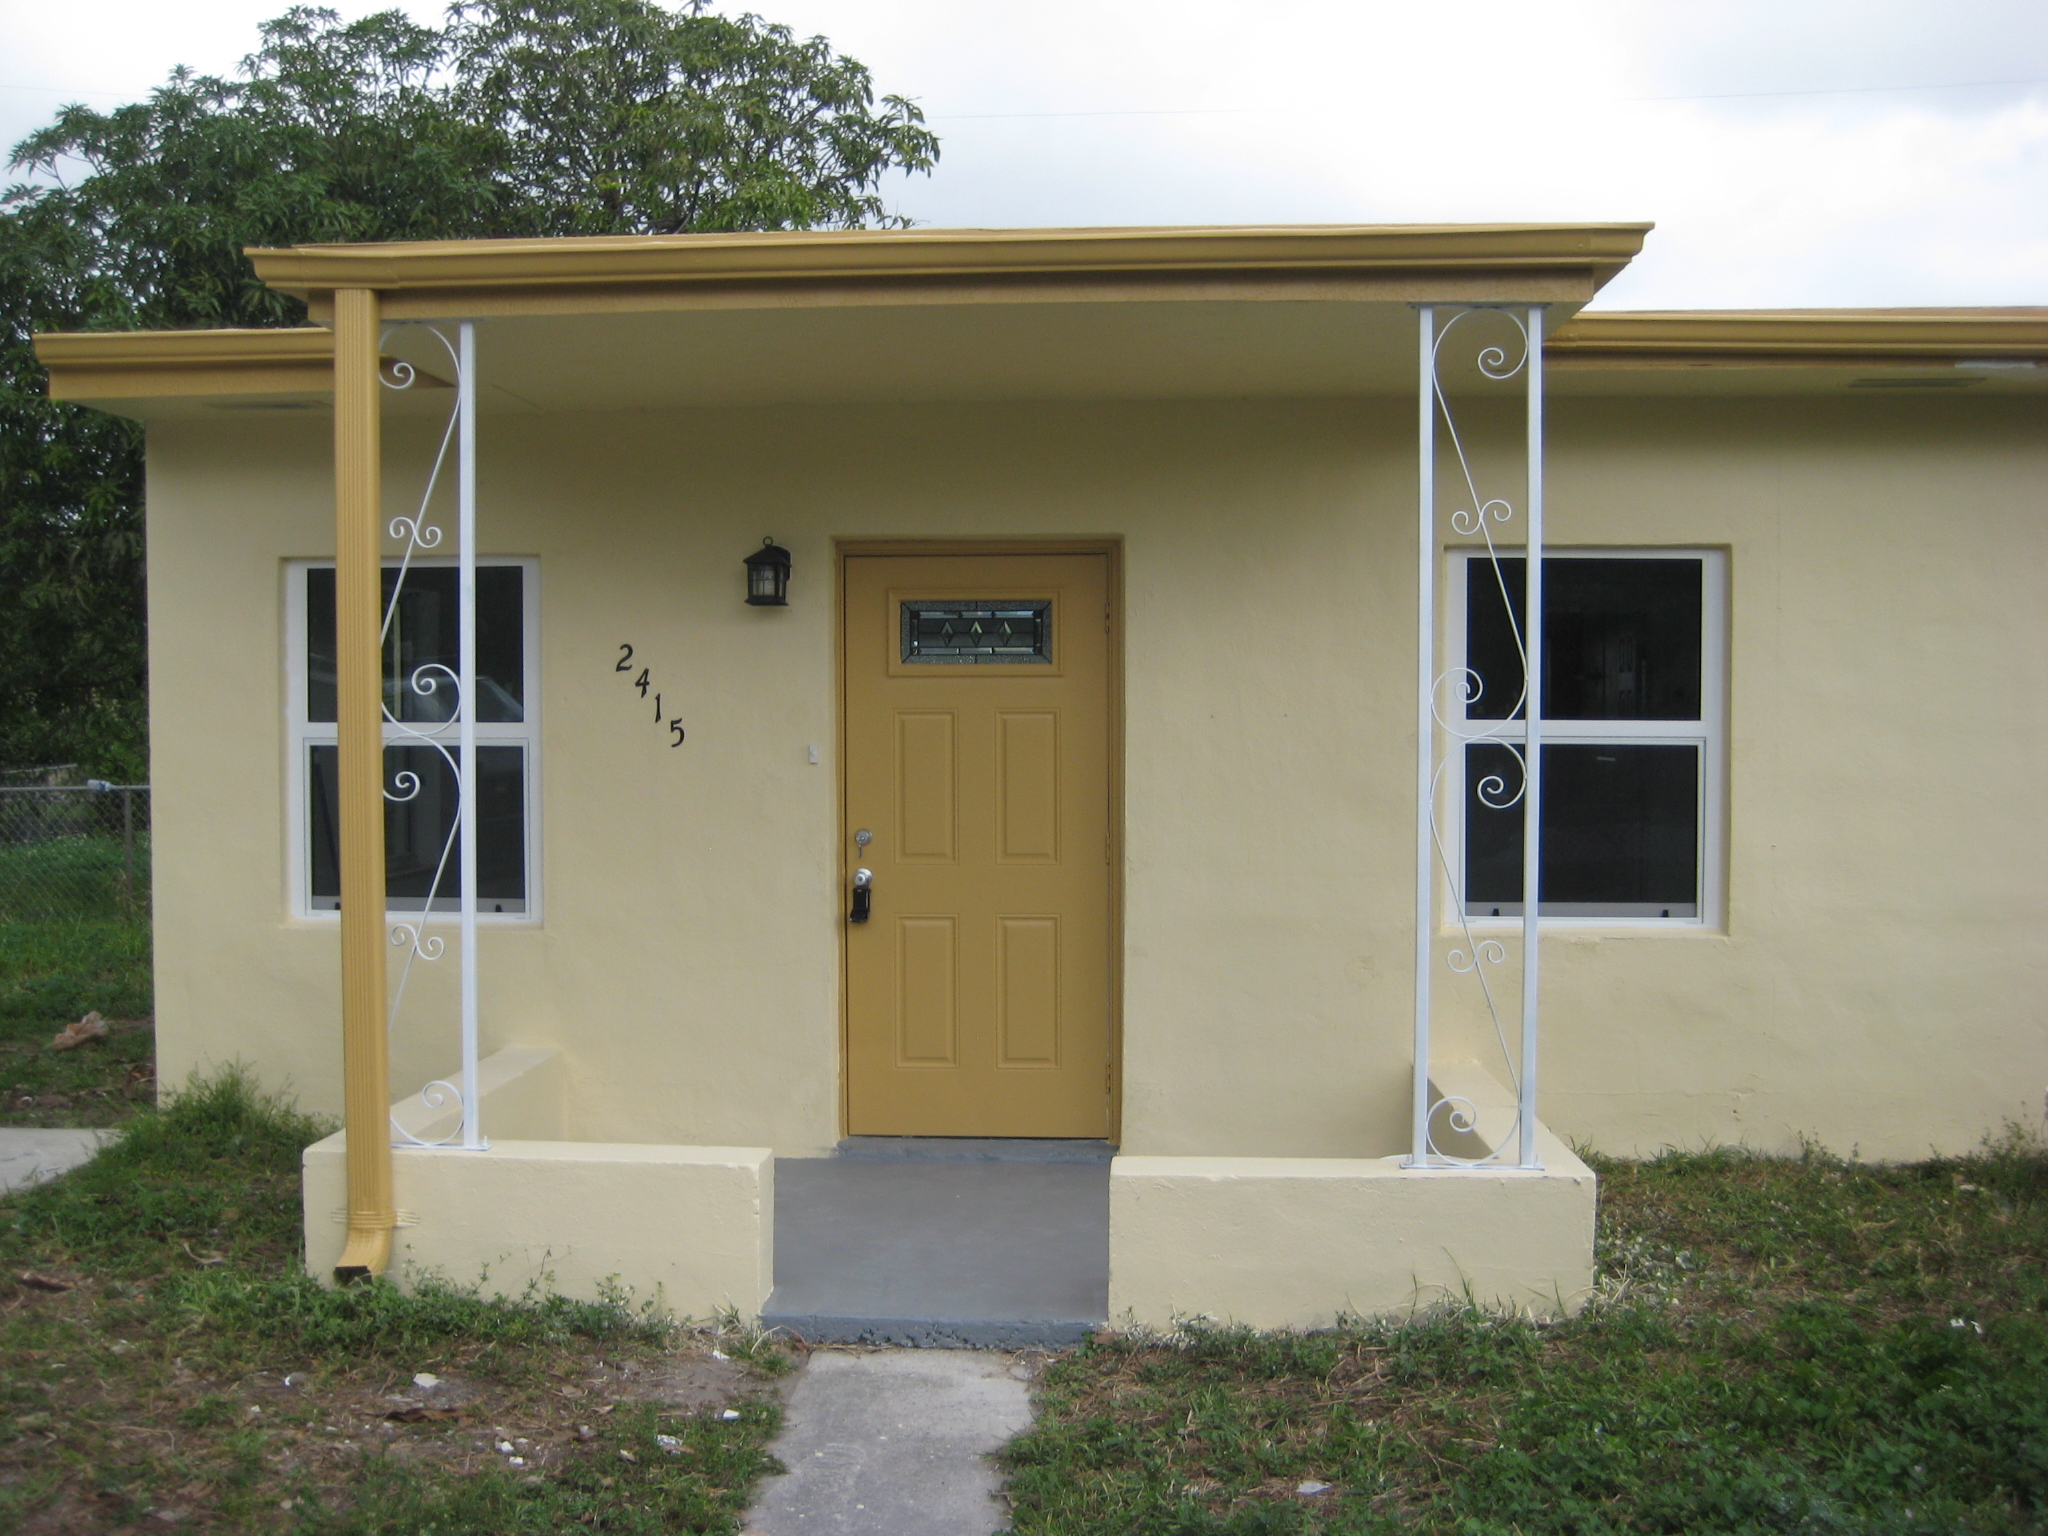 Opa-locka Residences - Unit 2415